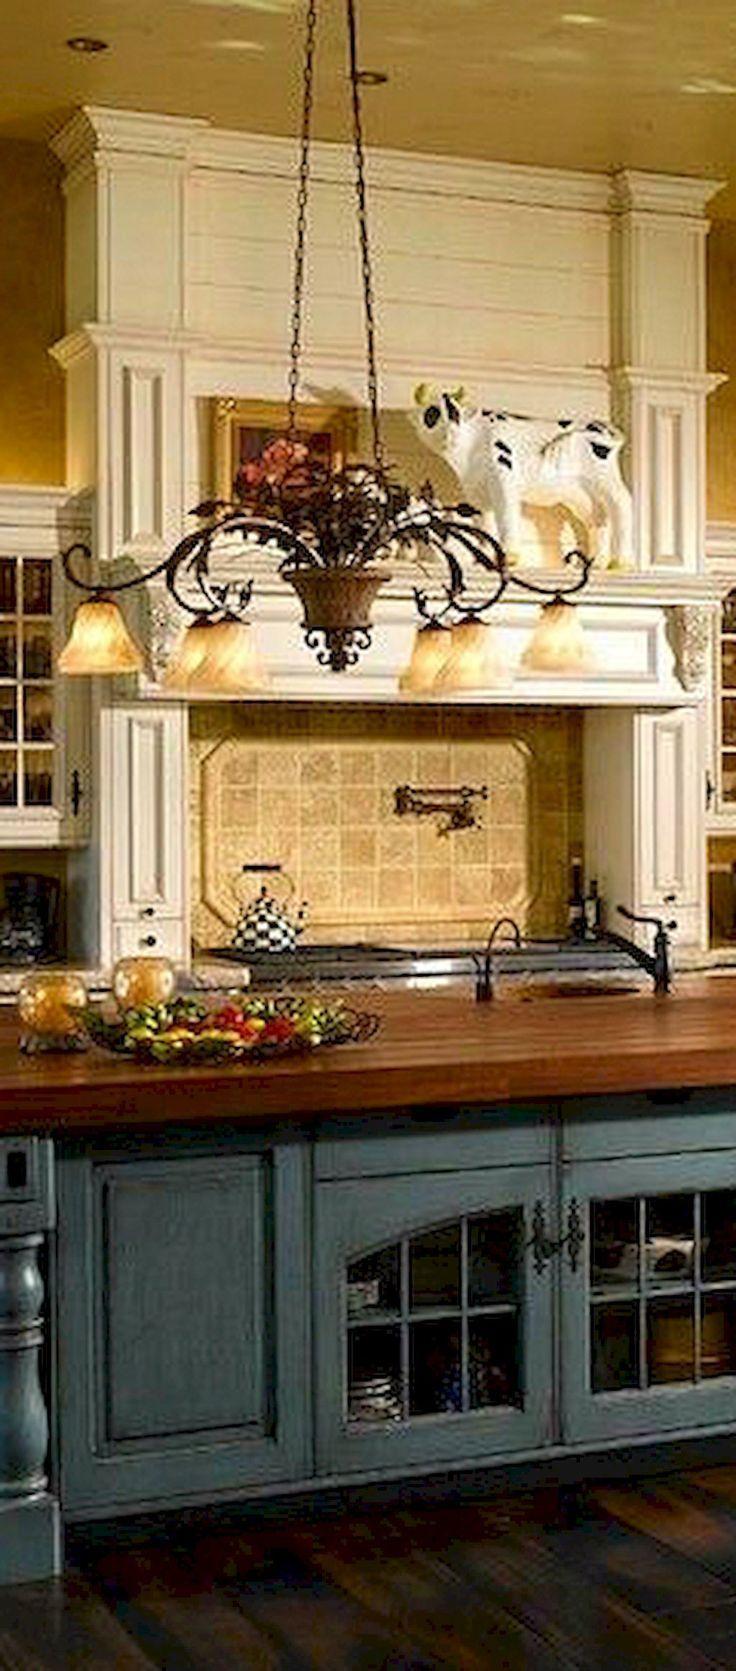 Best 25 Country Kitchen Designs Ideas On Pinterest 25 Country Kitchen As Best Of All Time Kit Country Kitchen Designs Country Kitchen French Country Kitchens